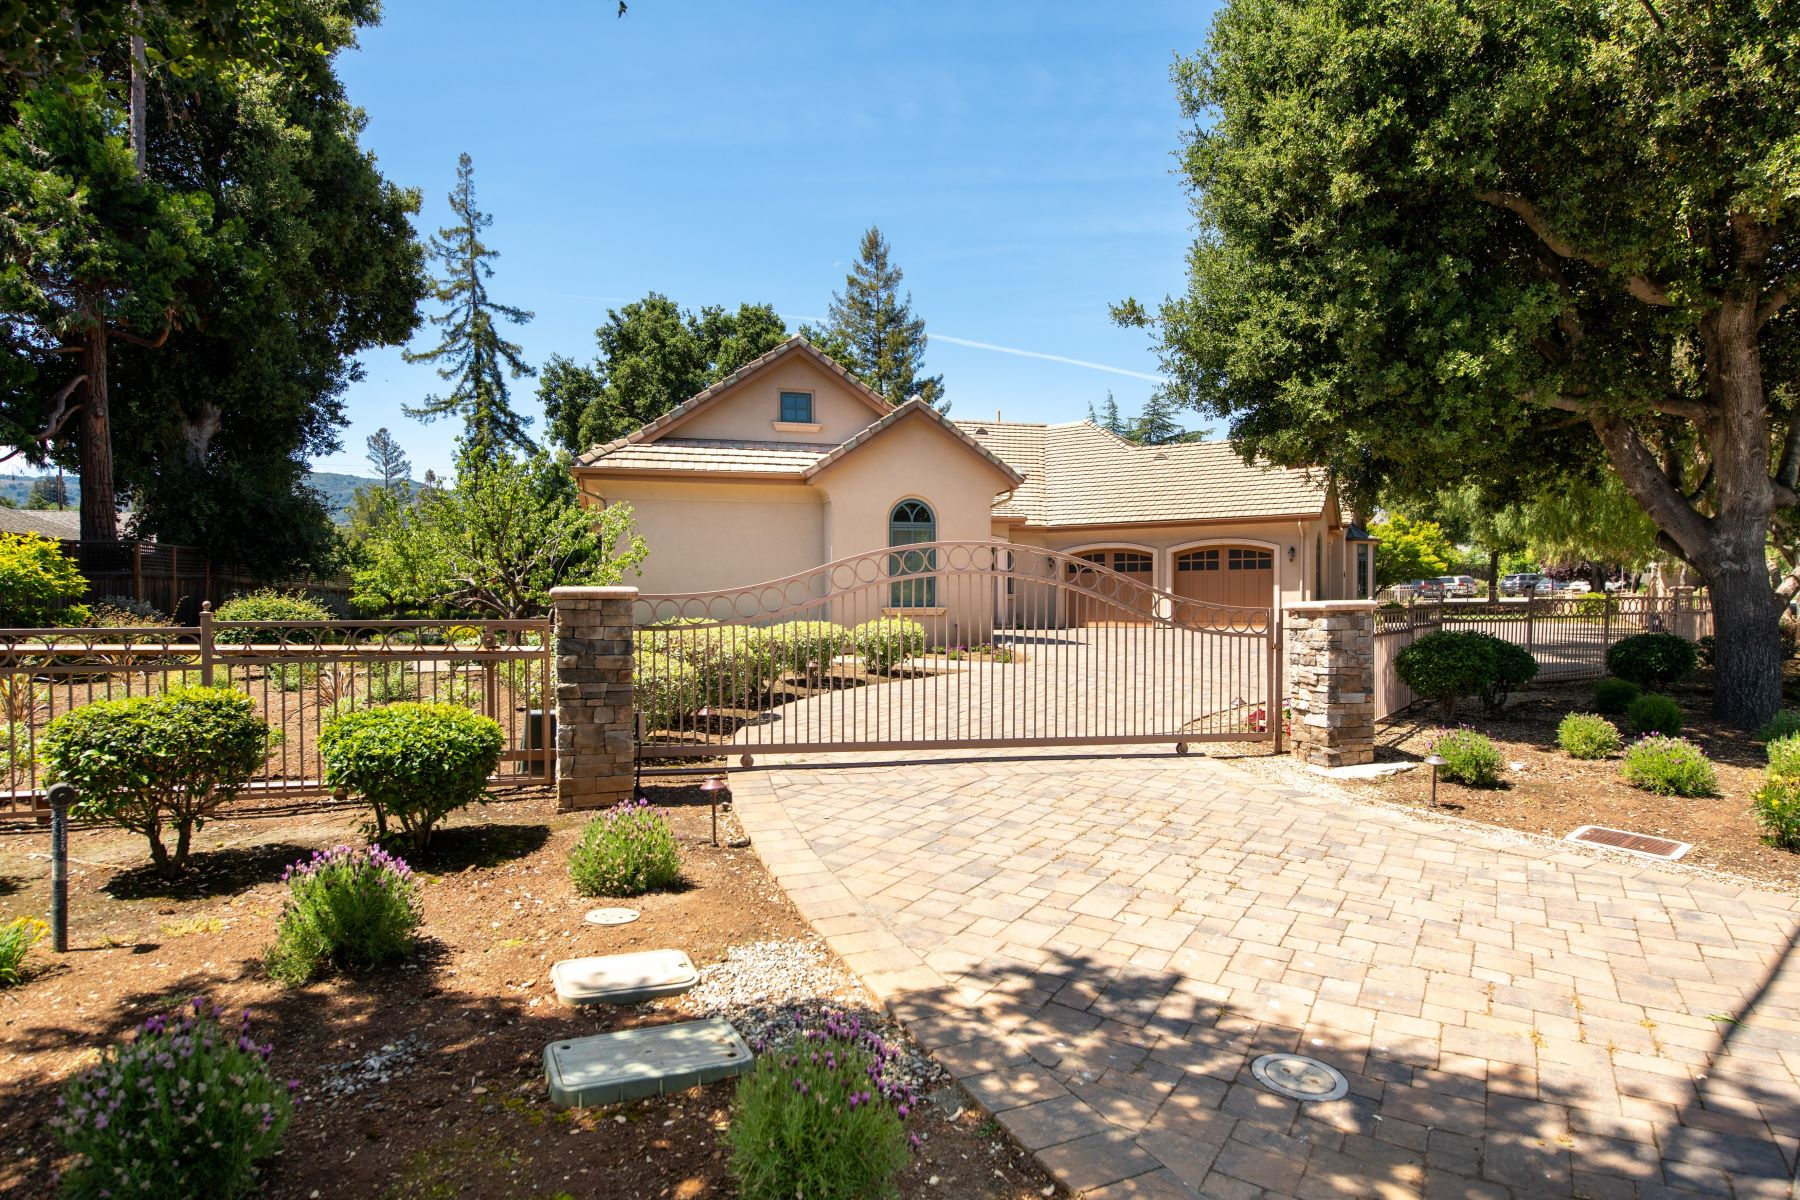 Single Family Homes for Sale at 186 Covington Rd Los Altos, California 94024 United States